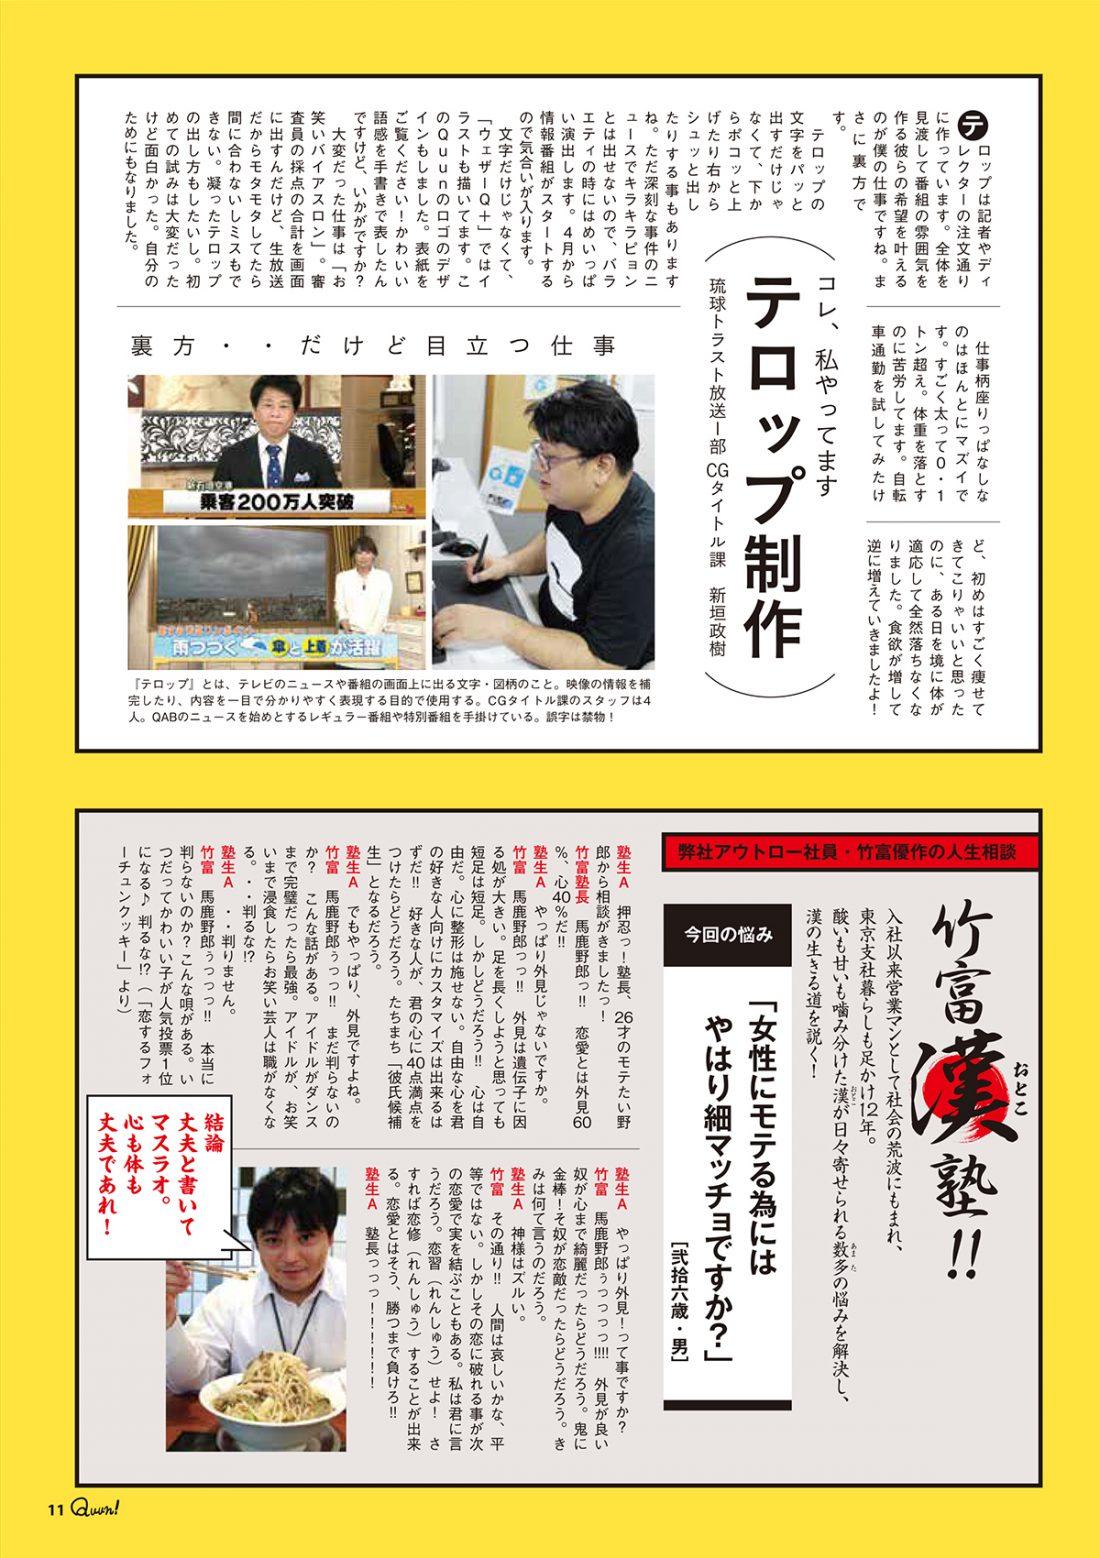 http://www.qab.co.jp/qgoro/wp-content/uploads/quun_0113-1100x1558.jpg